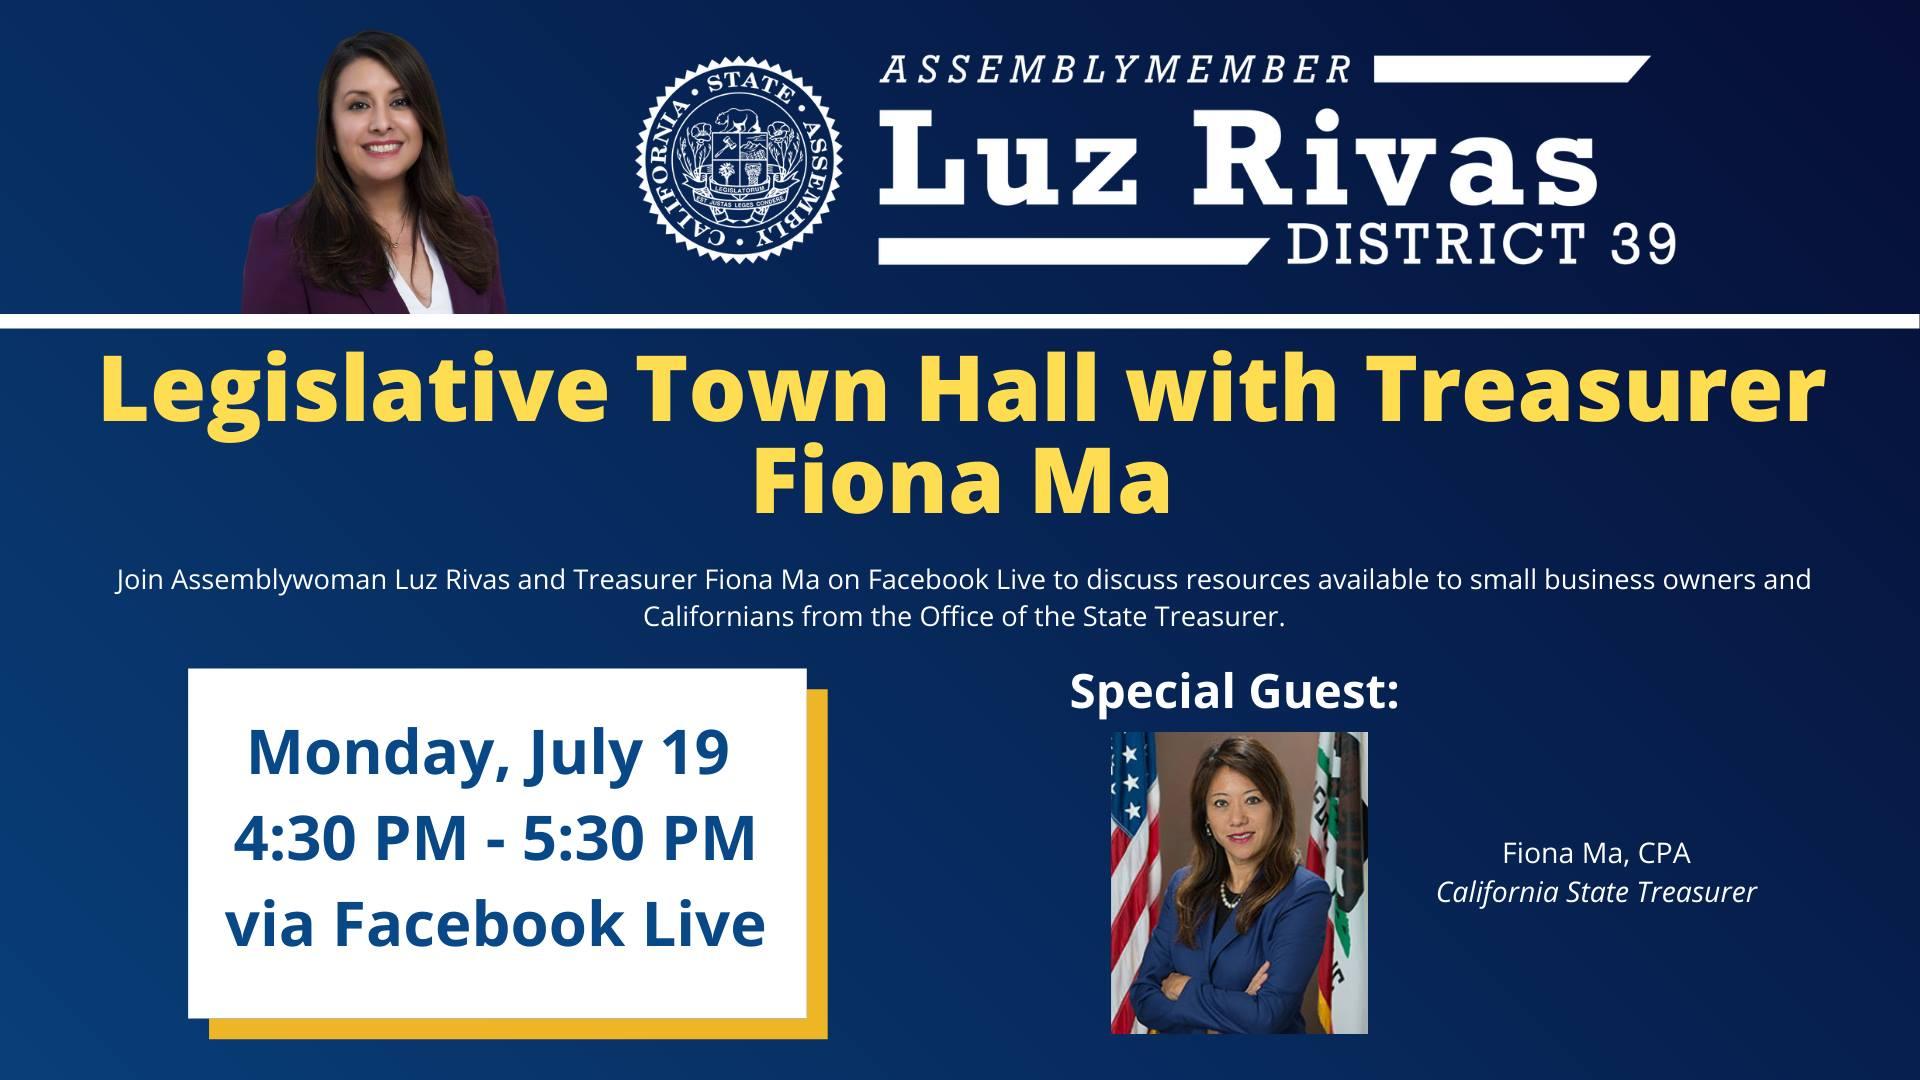 Join me and Treasurer Fiona Ma